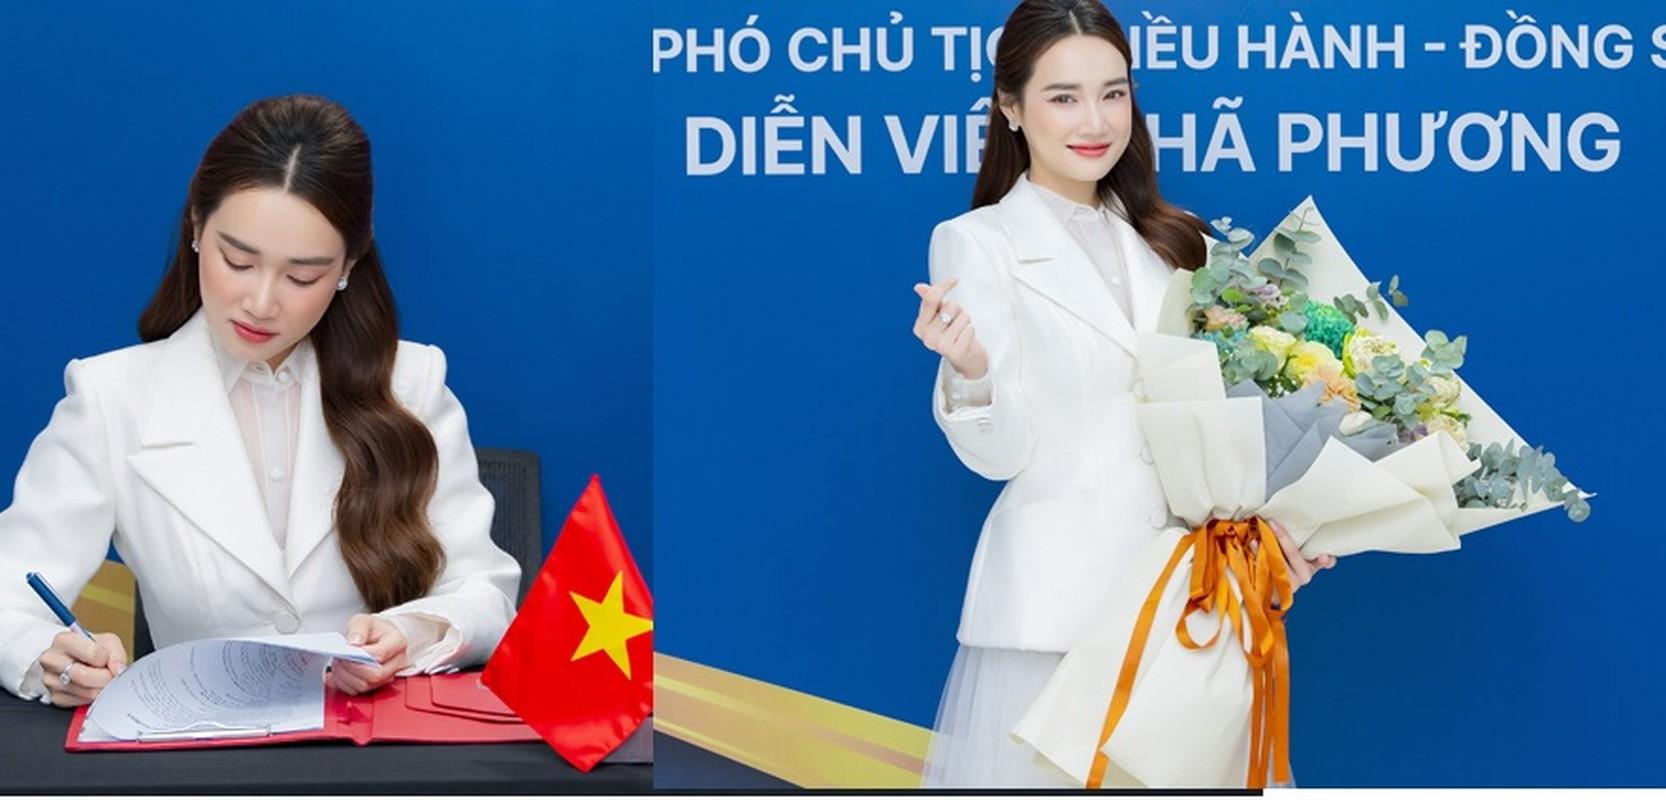 Kiem tien khung, Nha Phuong quan ly chi tieu cua chong the nao?